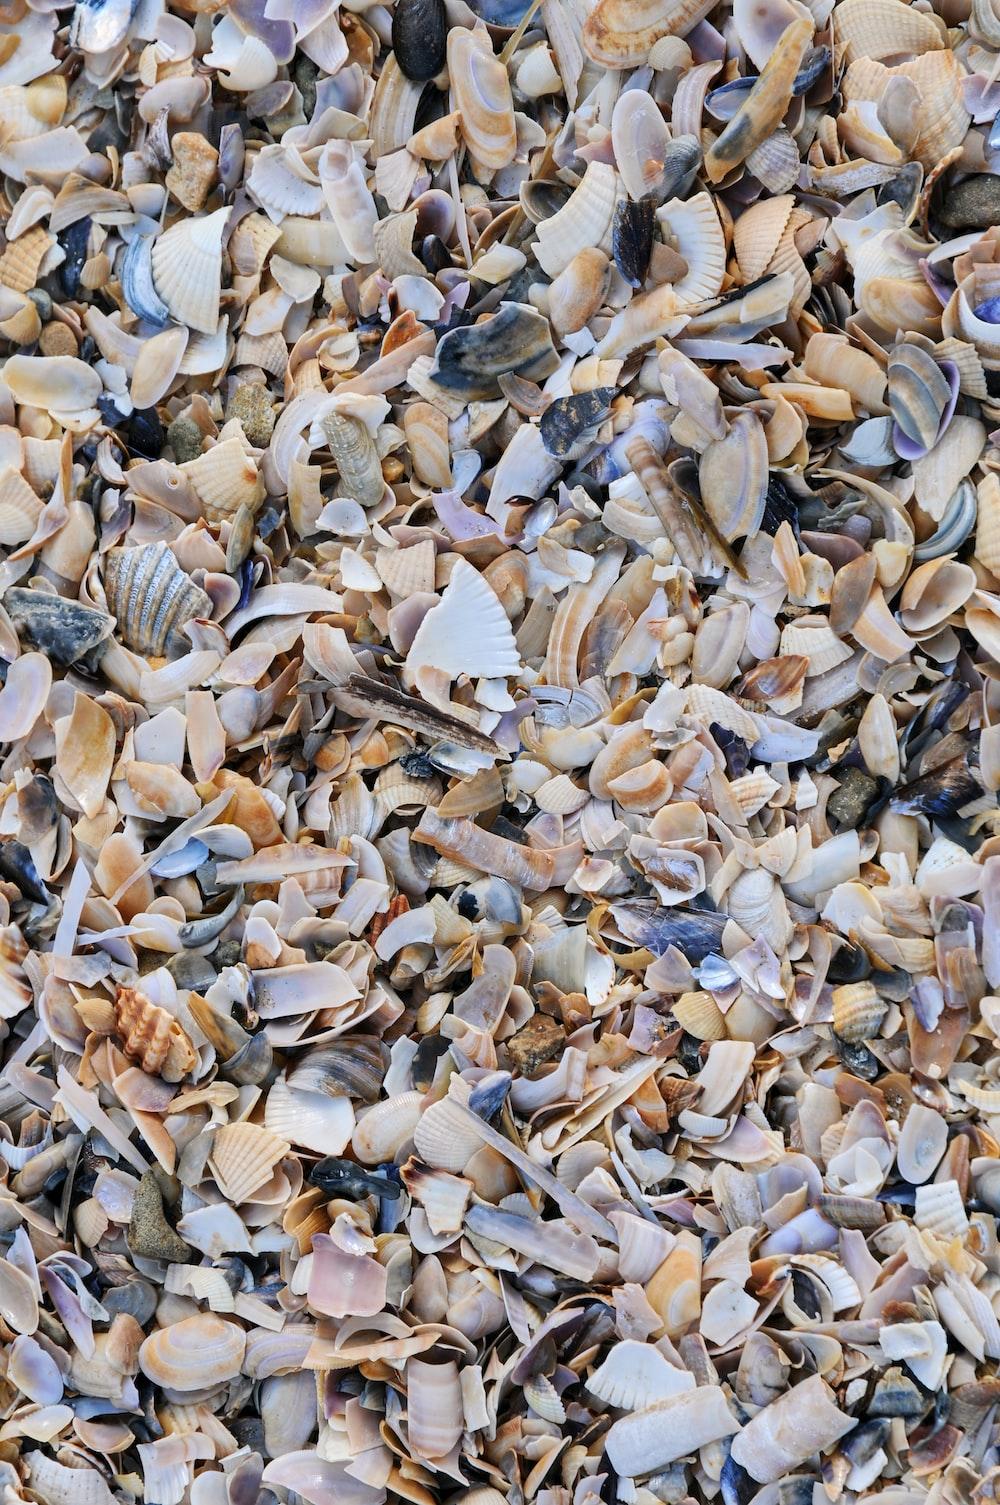 white and gray seashells on white sand